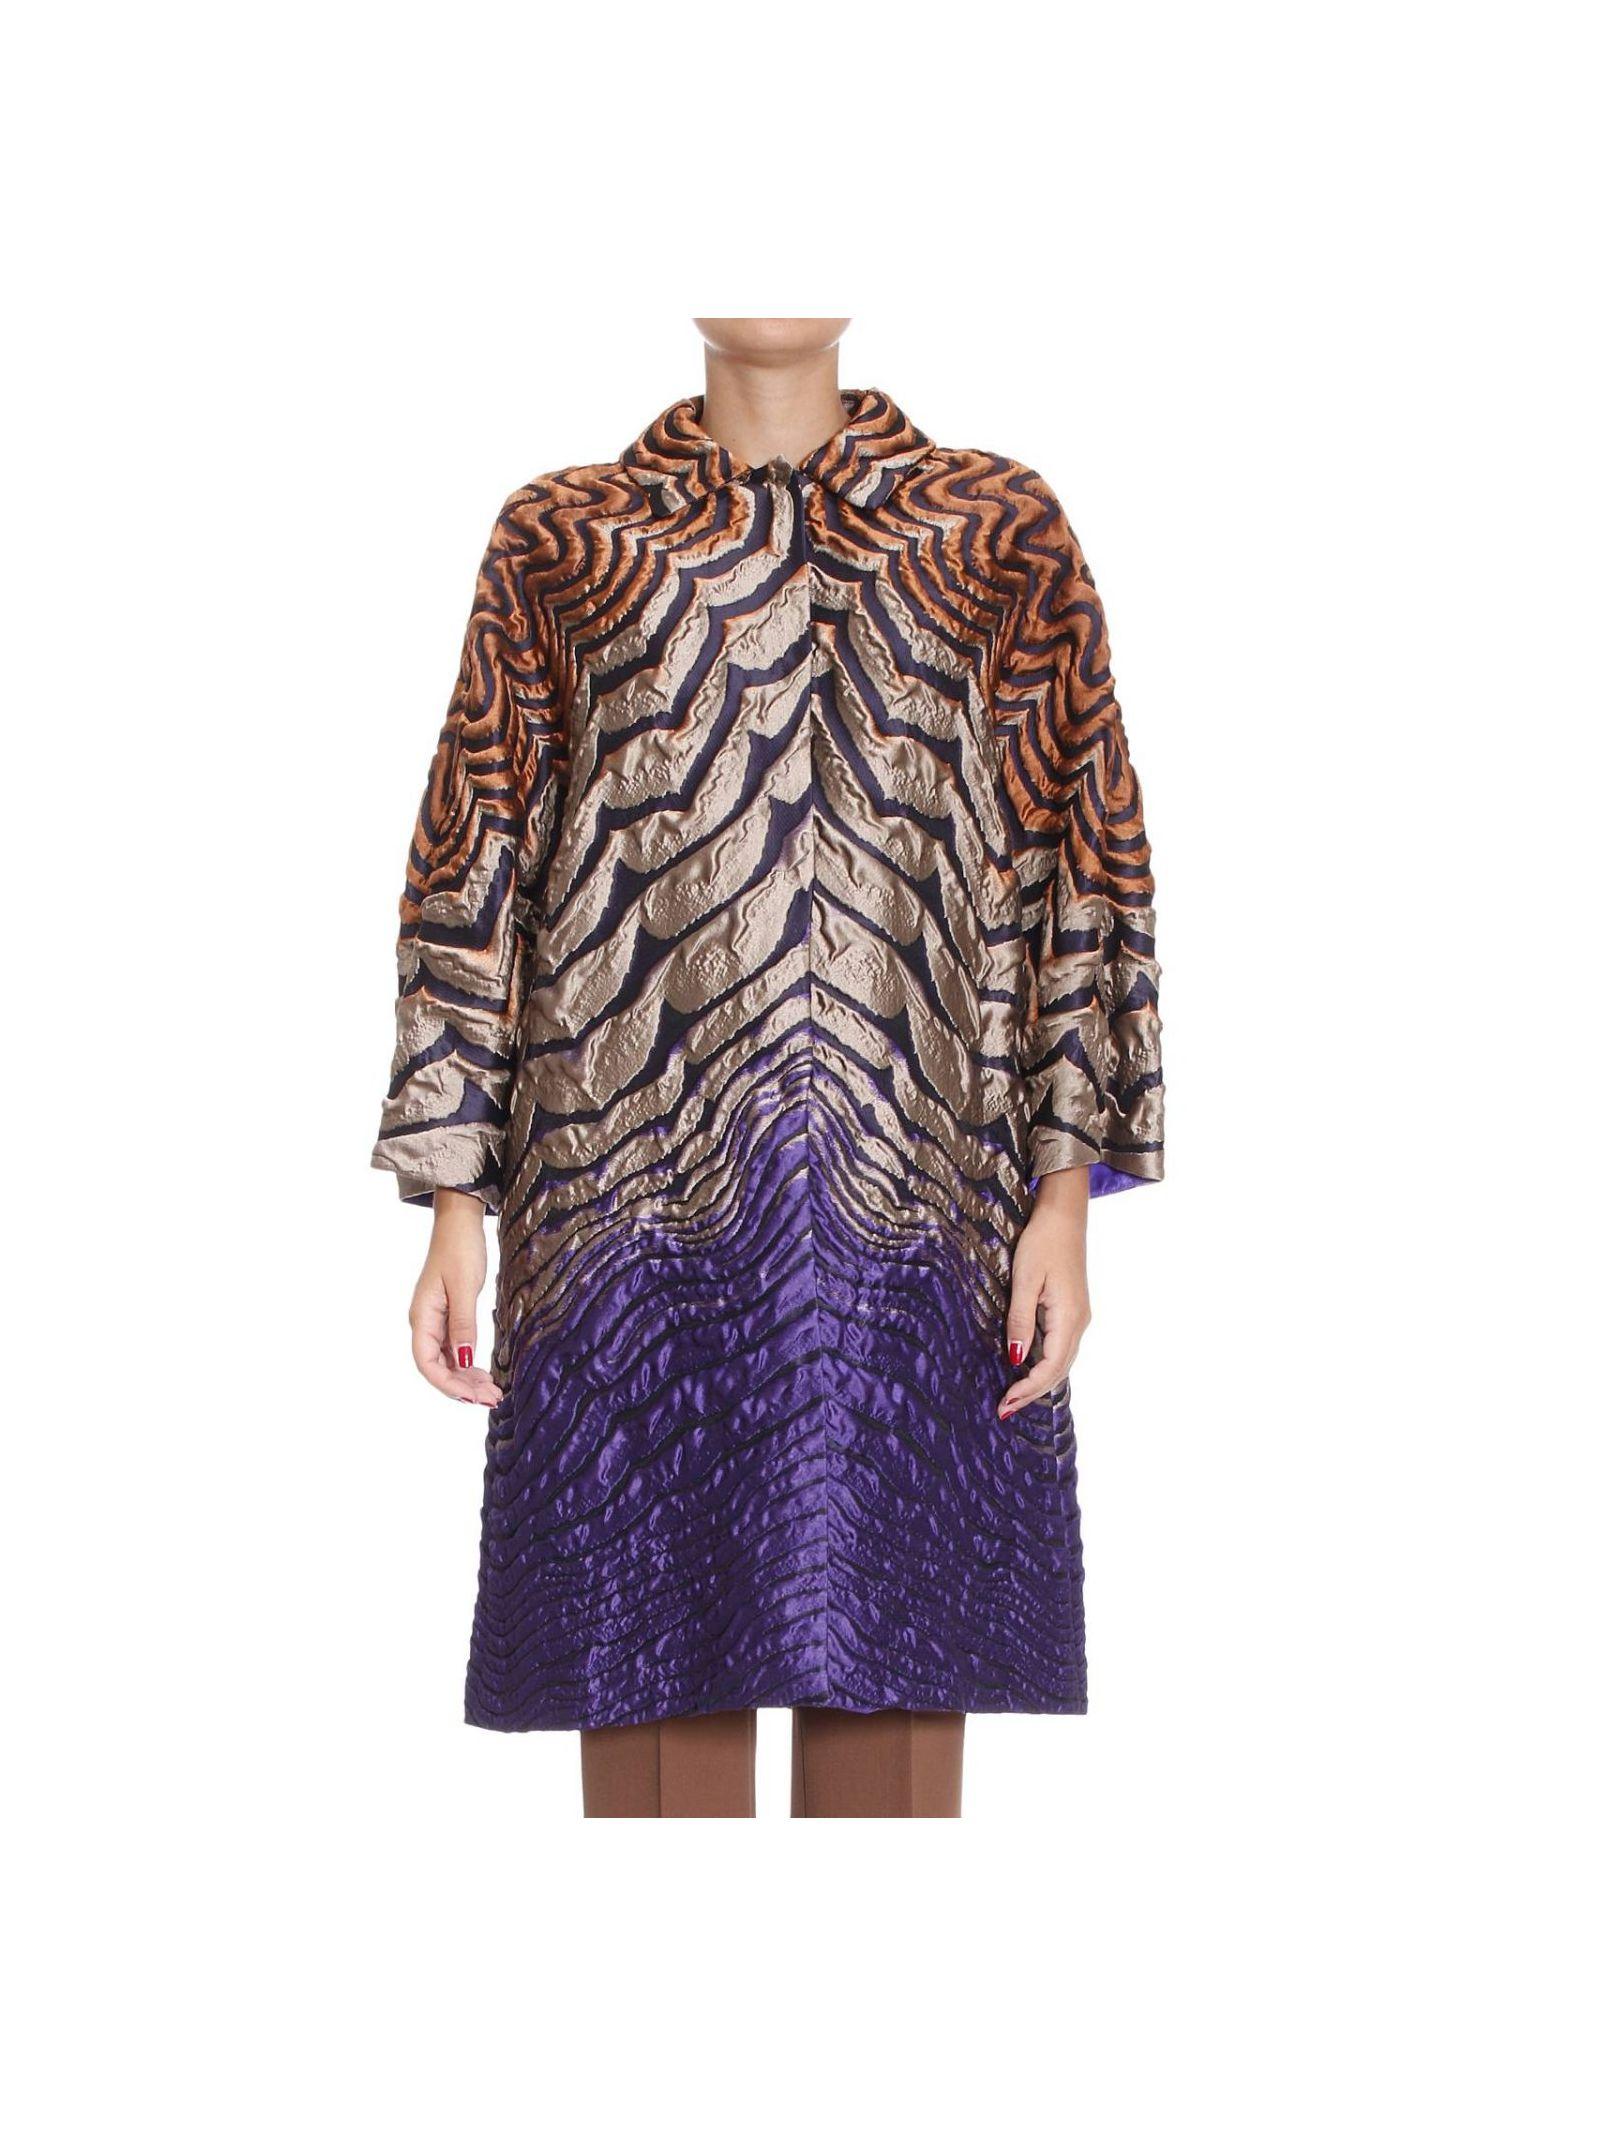 Coat Coat Woman Alberta Ferretti